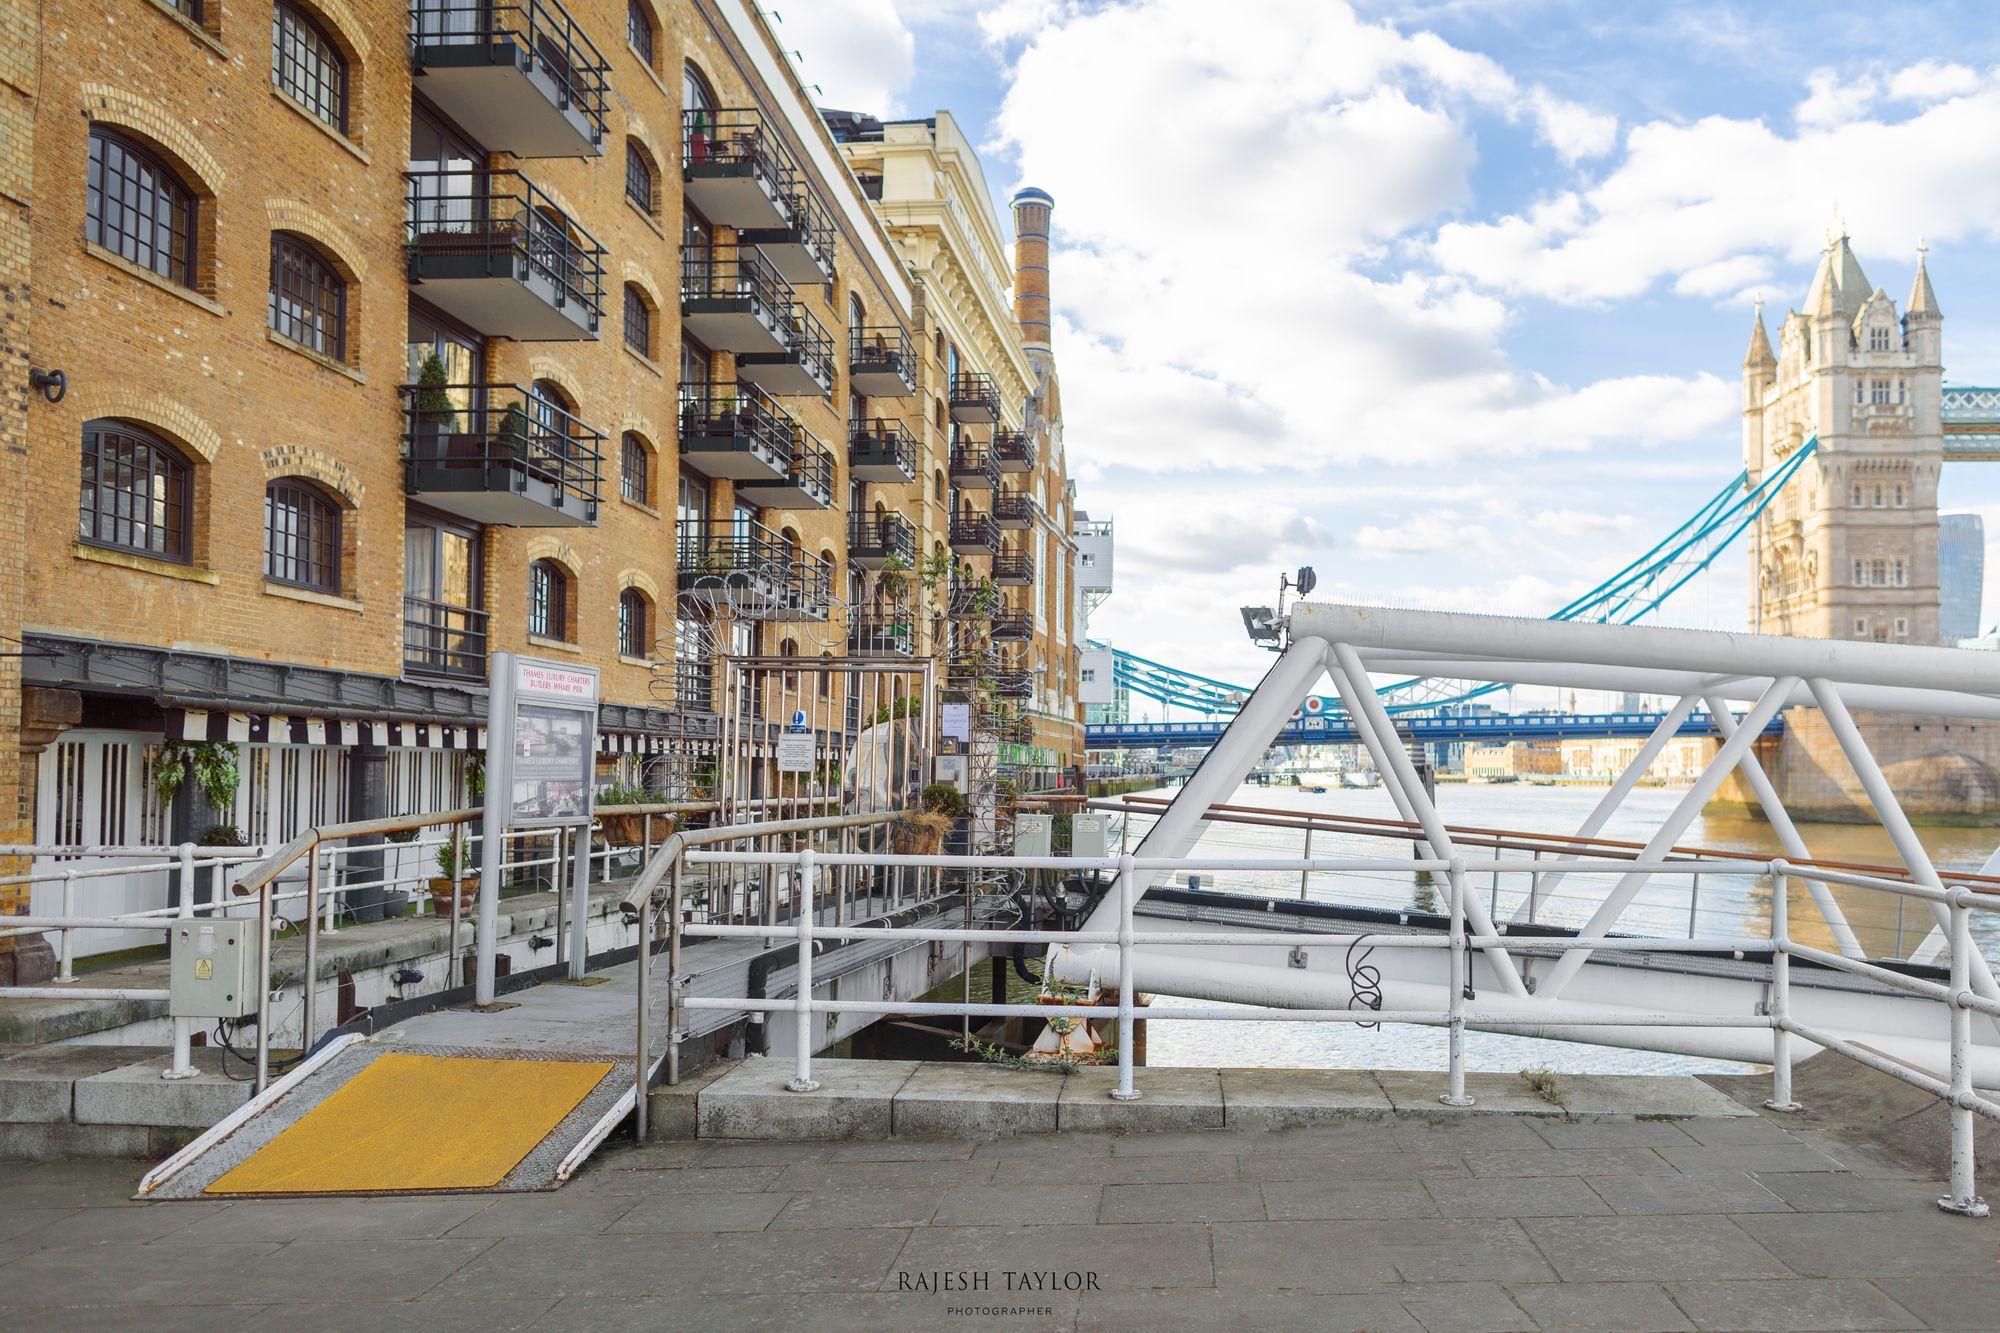 Butlers Wharf Pier facing Tower Bridge © Rajesh Taylor